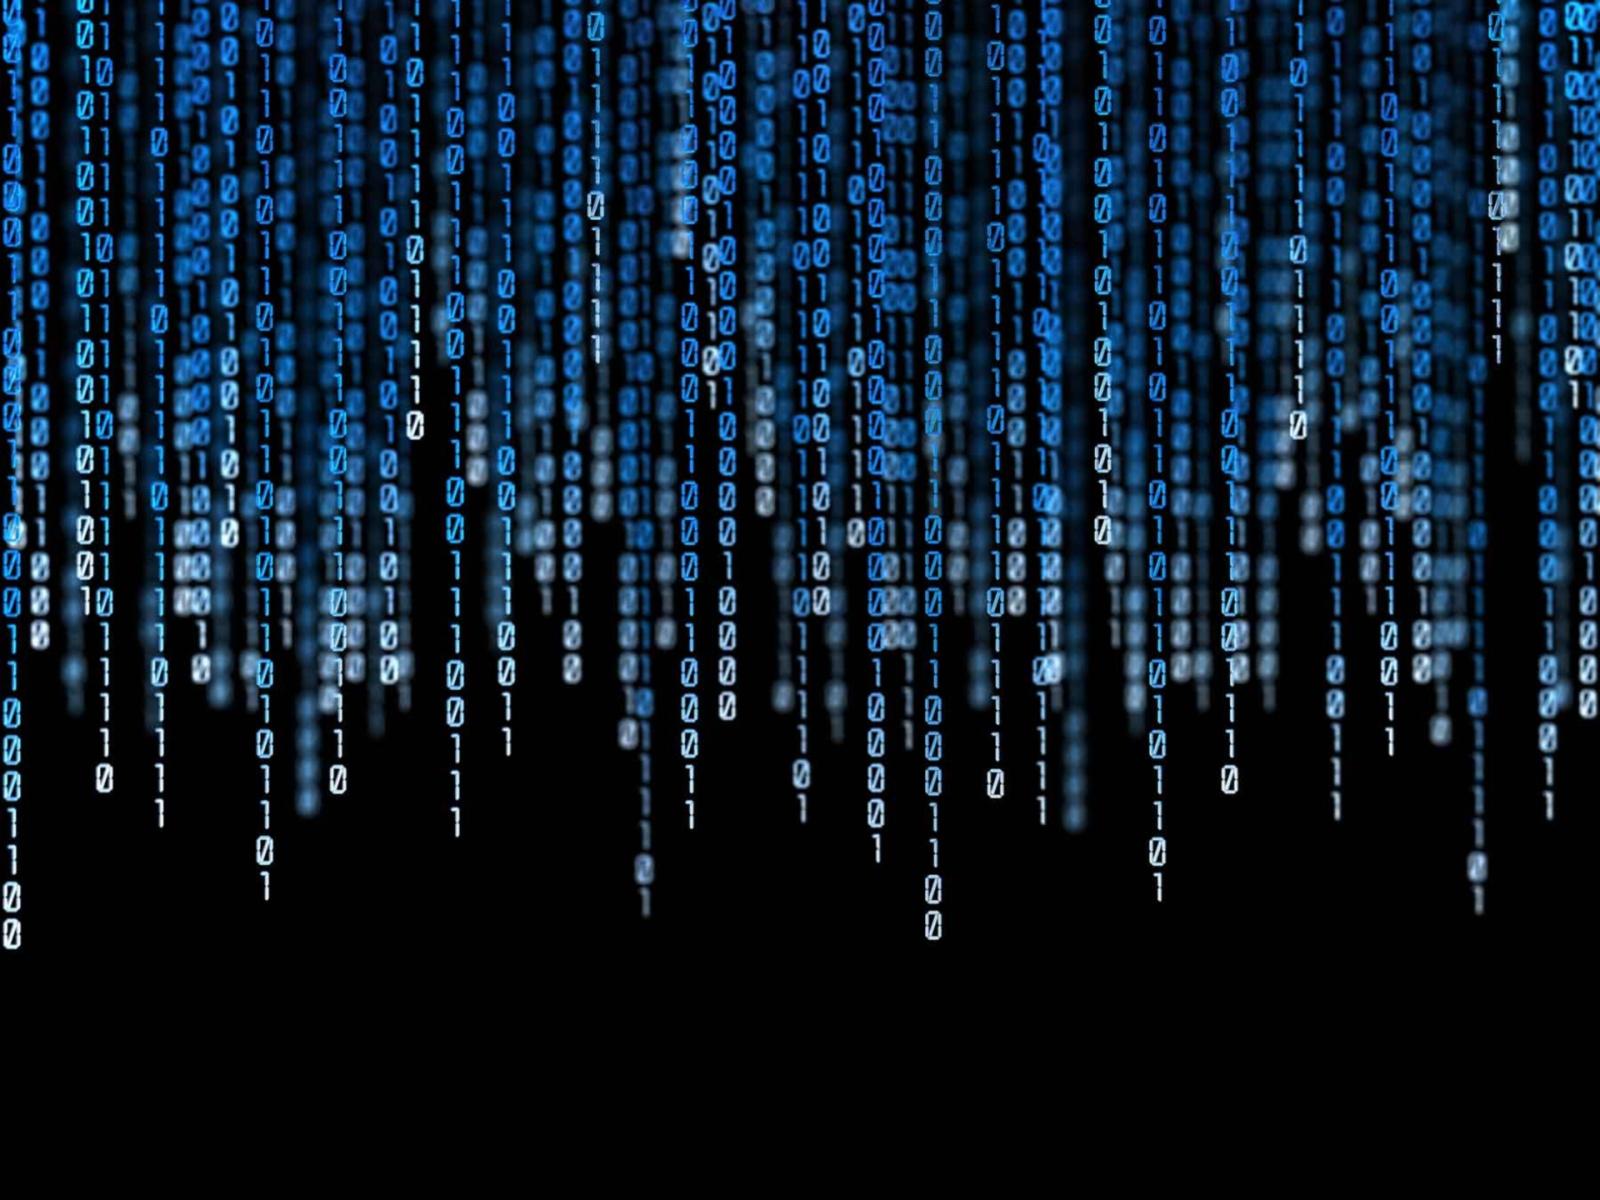 Technology   Programming Wallpaper 1600x1200